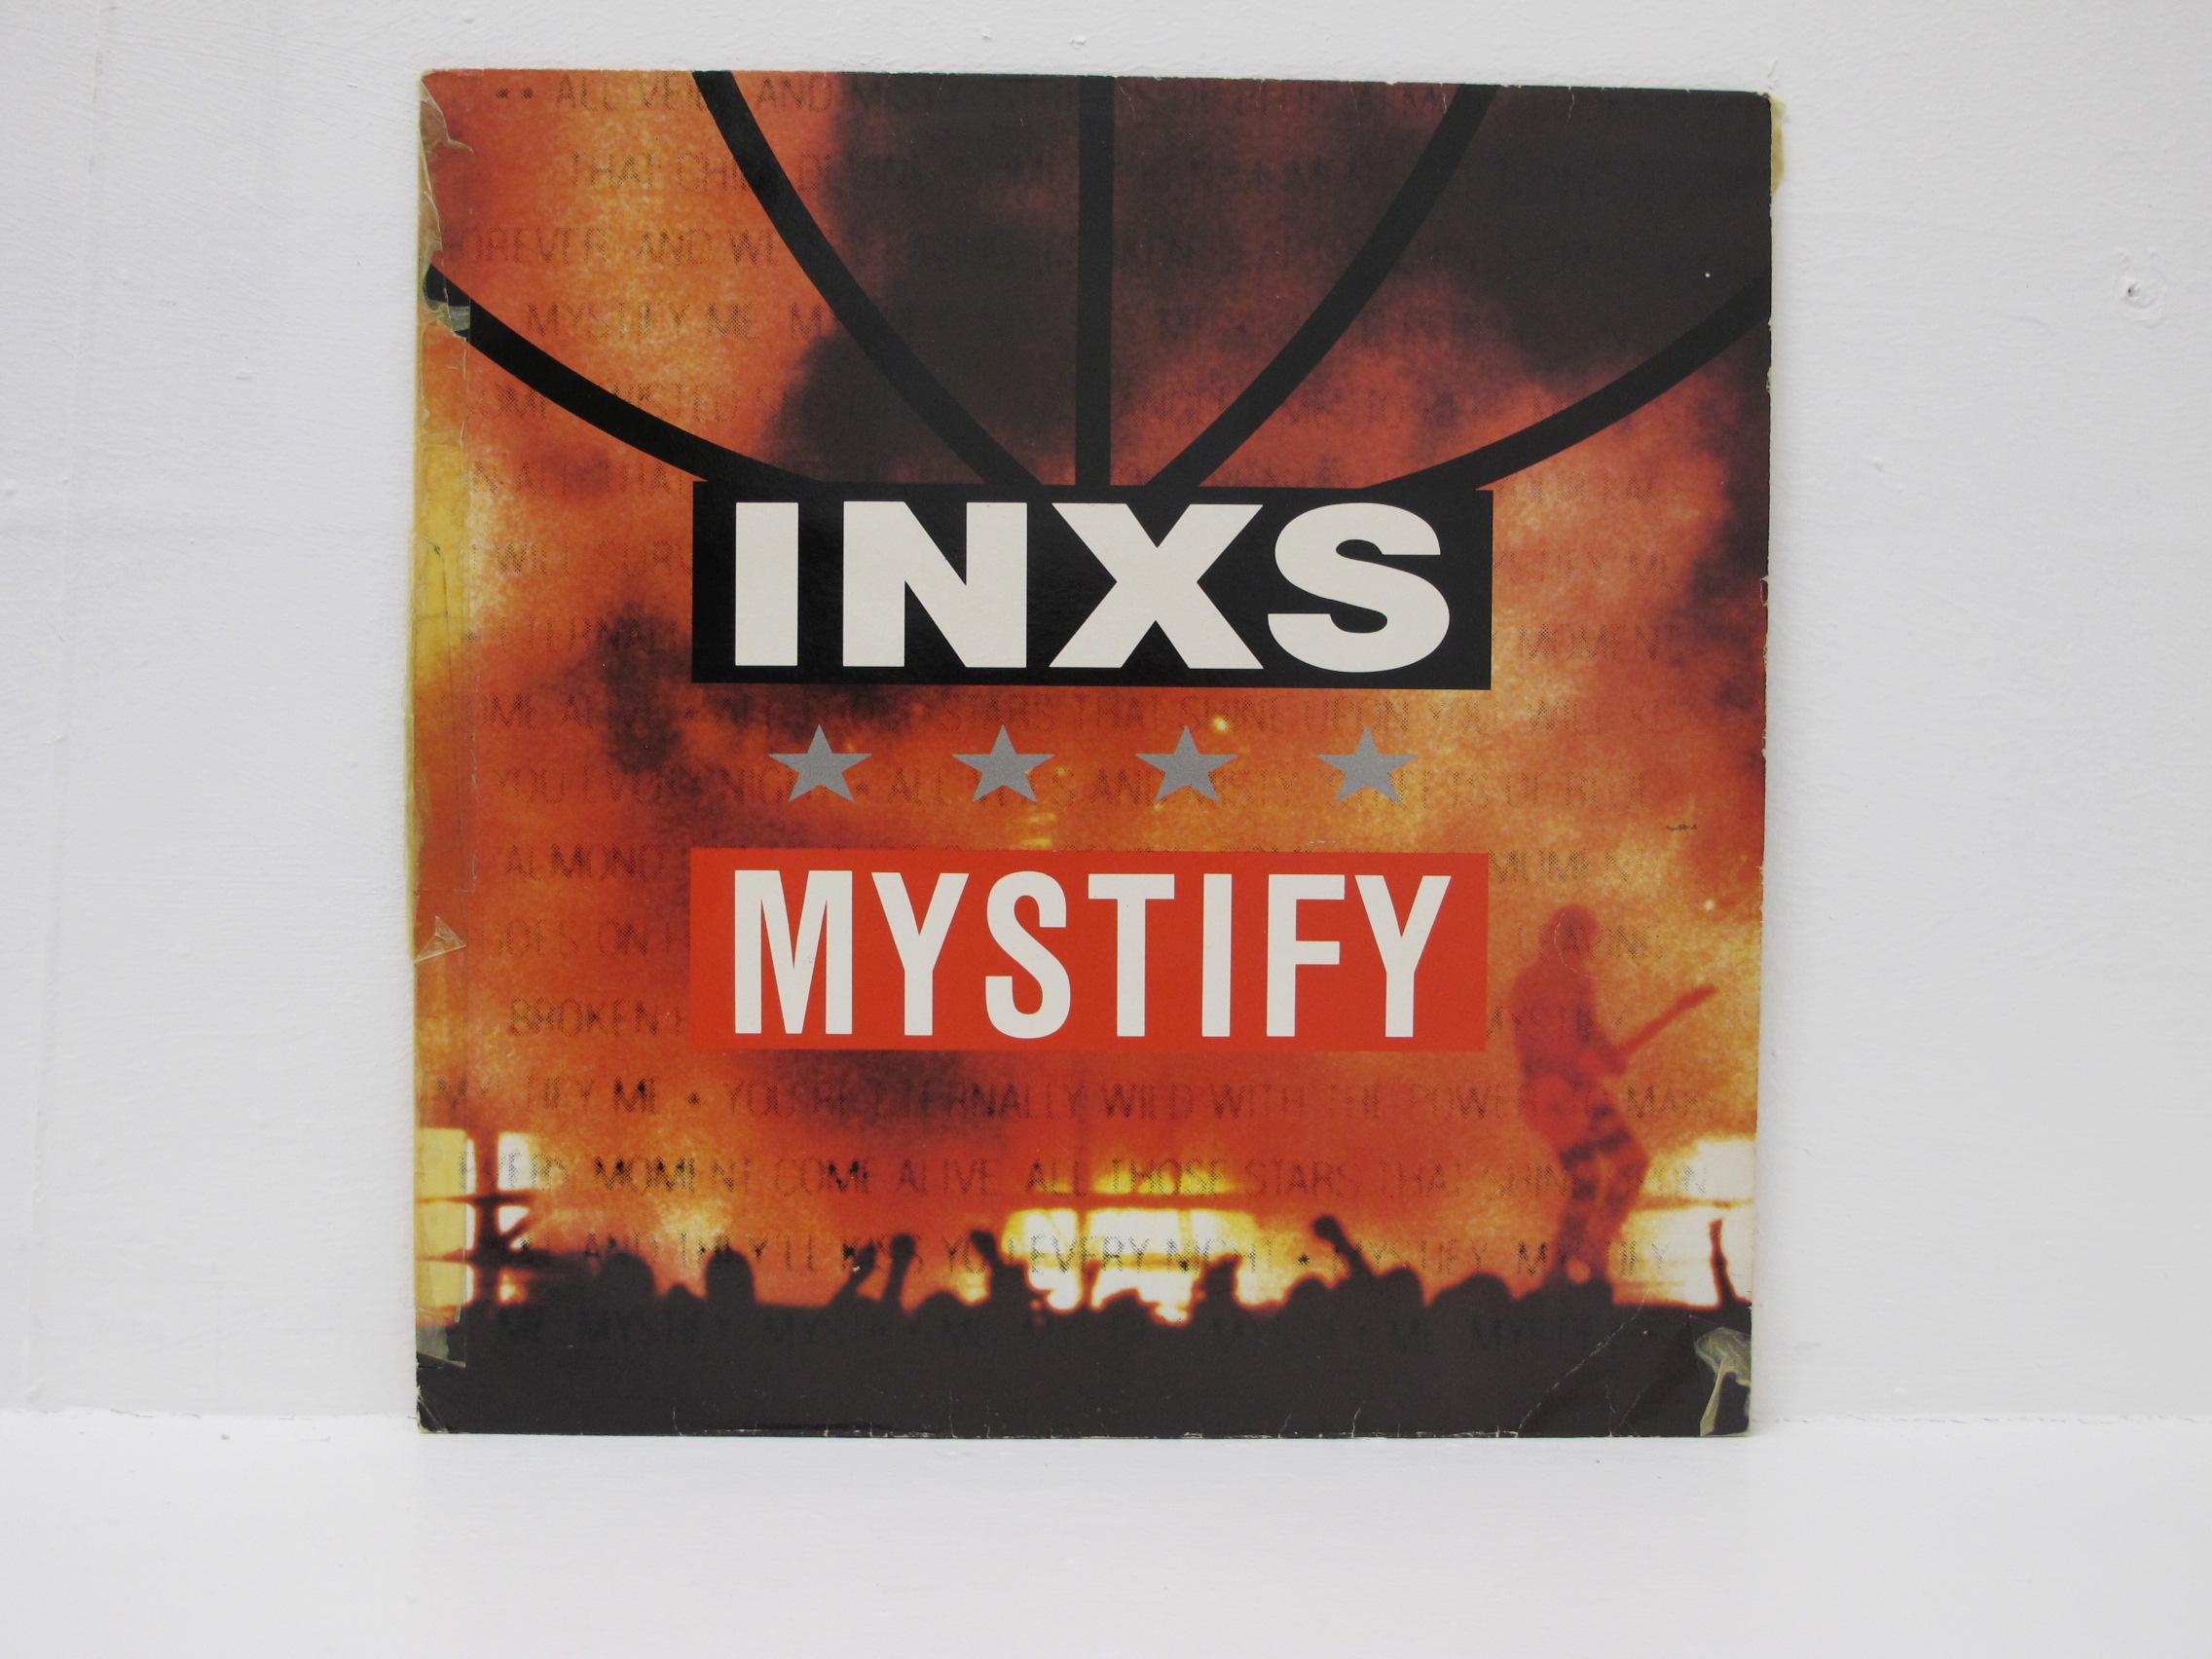 INXS - Mystify